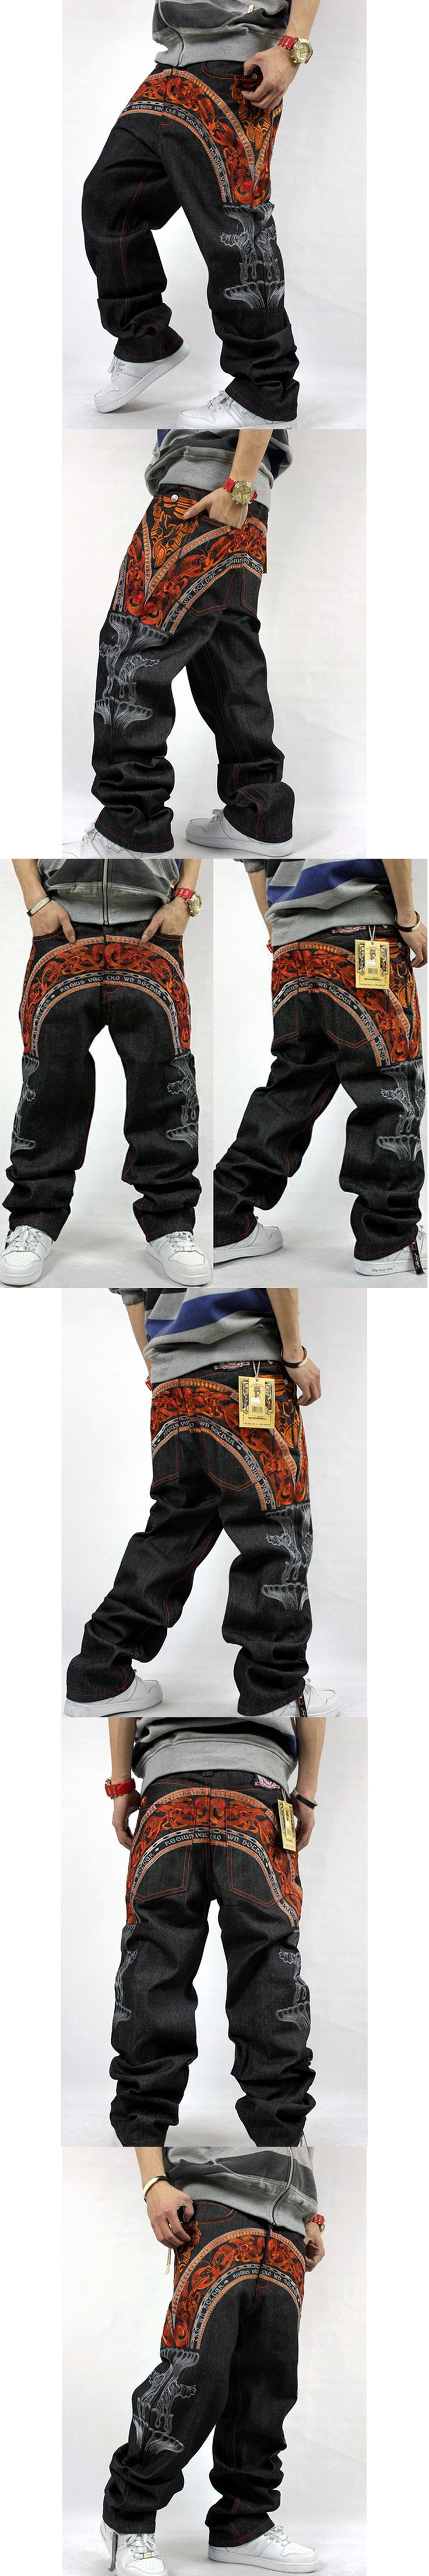 New Design Male Street Skateboard Baggy Jeans Mens Hip Hop Rock Loose Trousers Big Size Rap Pants For Rapper's Waist Size 30-42